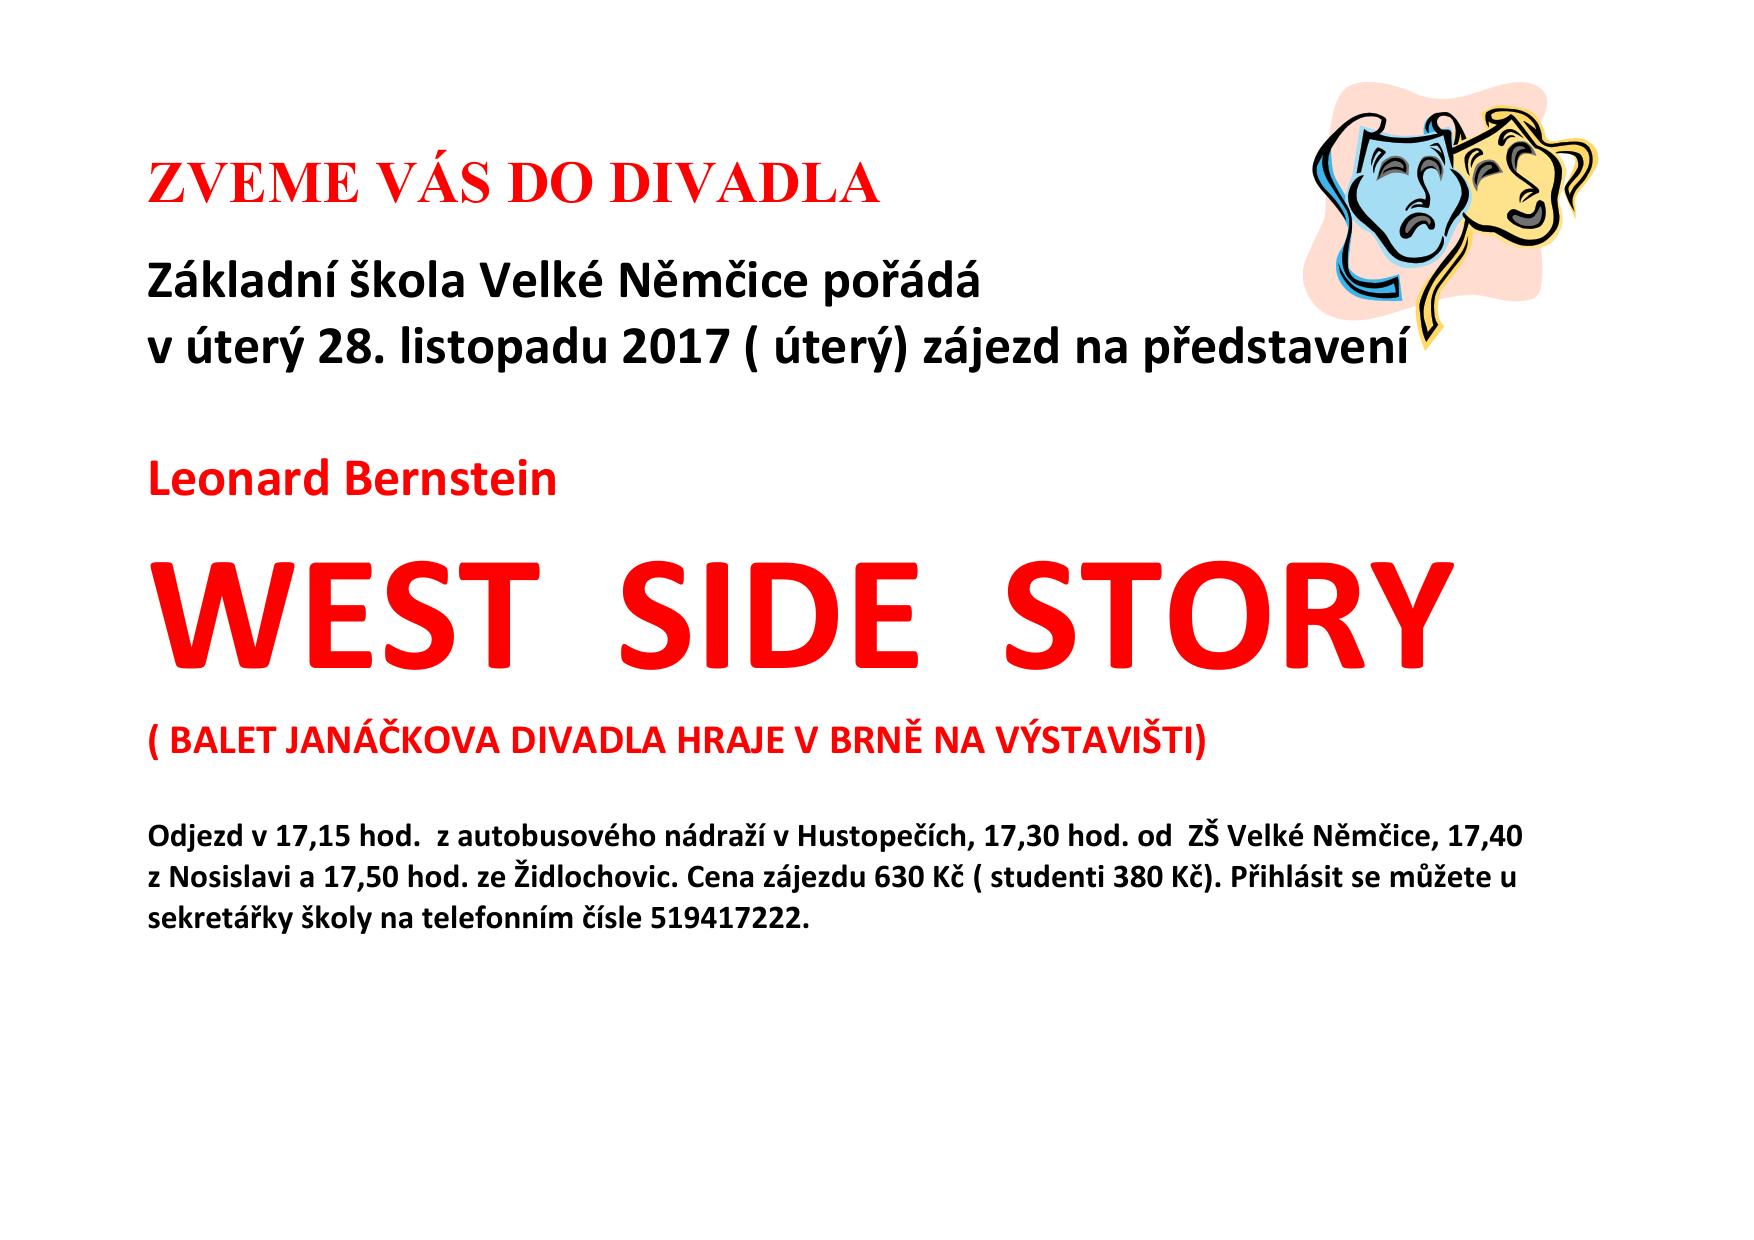 WEST SIDE STORY.pdf-000001